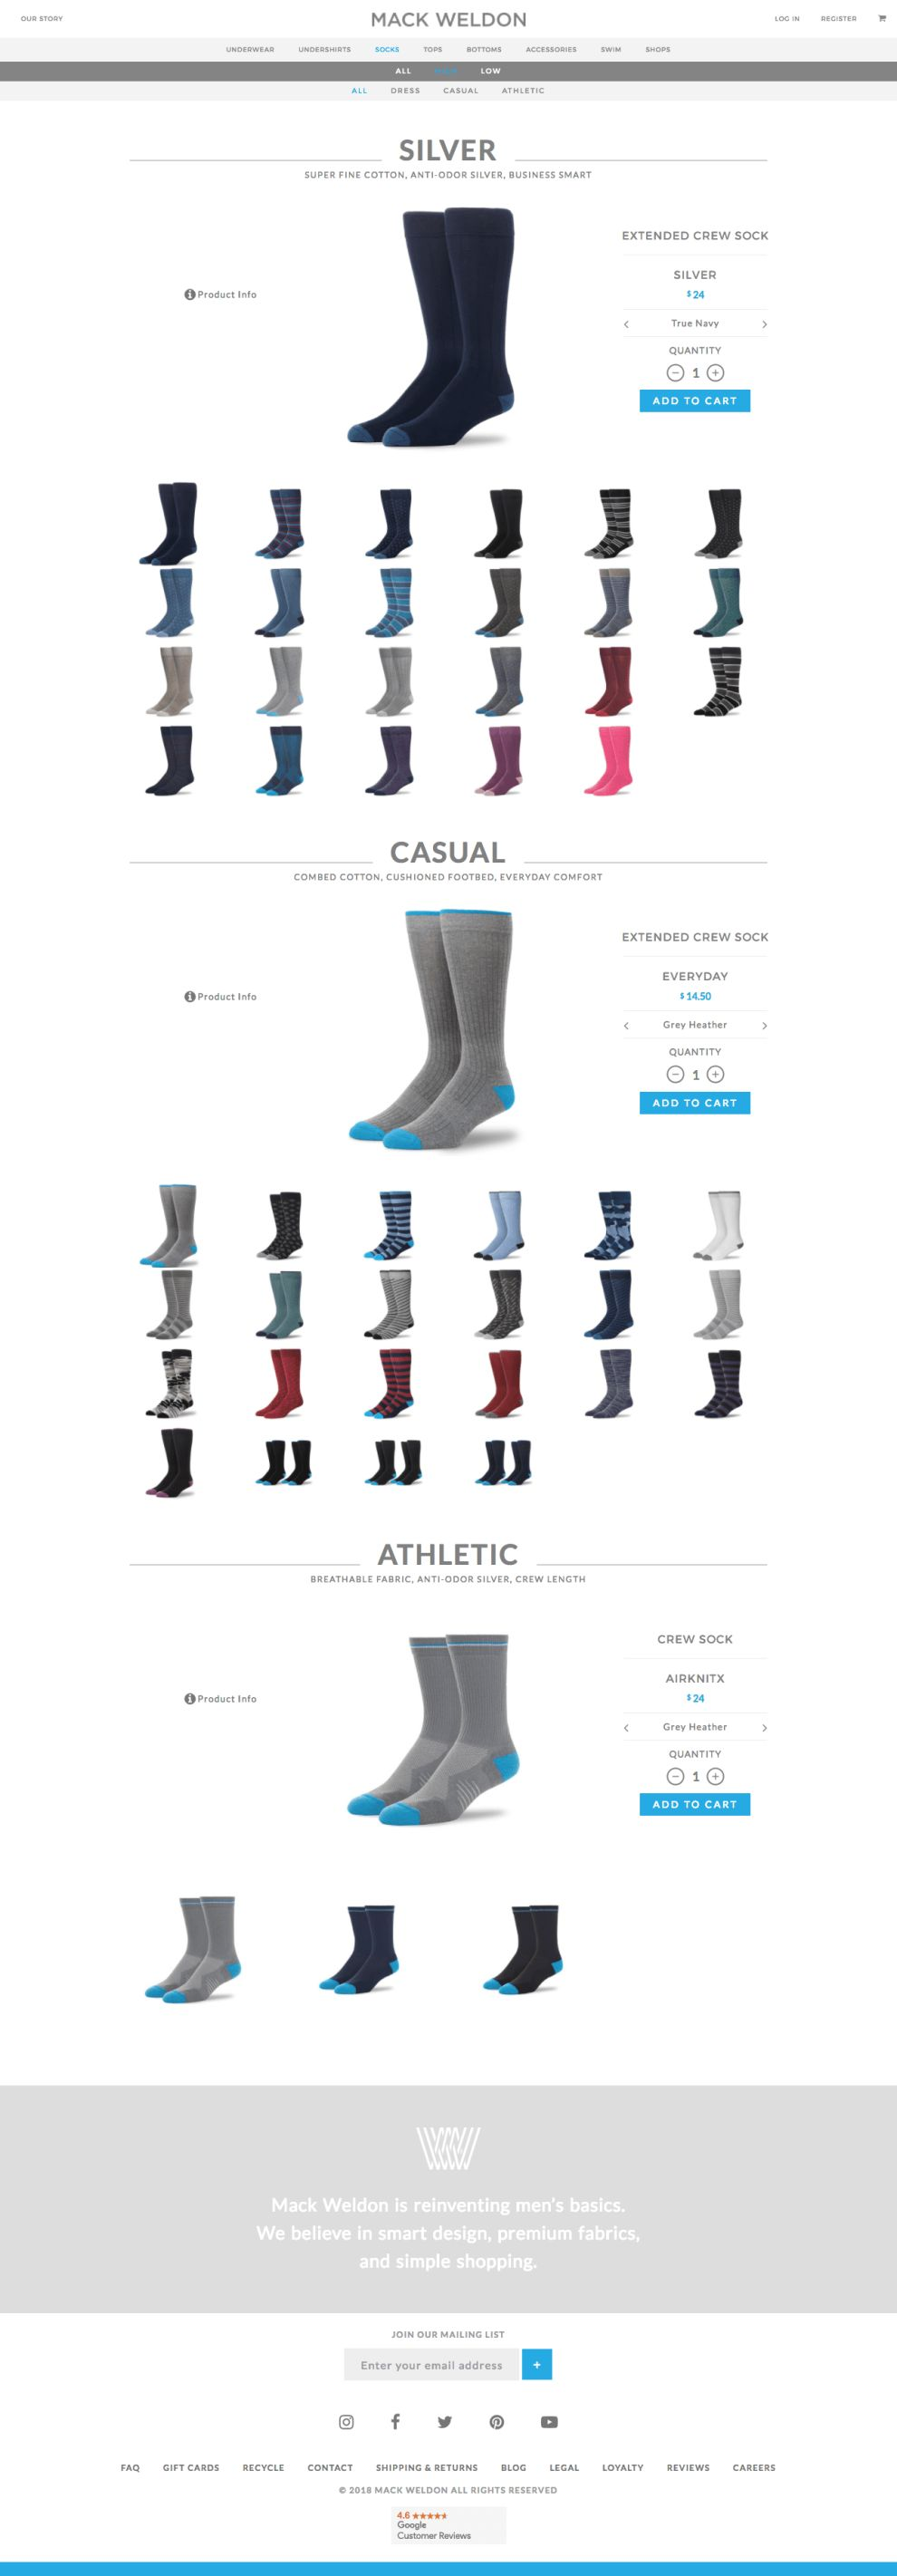 Mack Weldon Informative Website Product Page